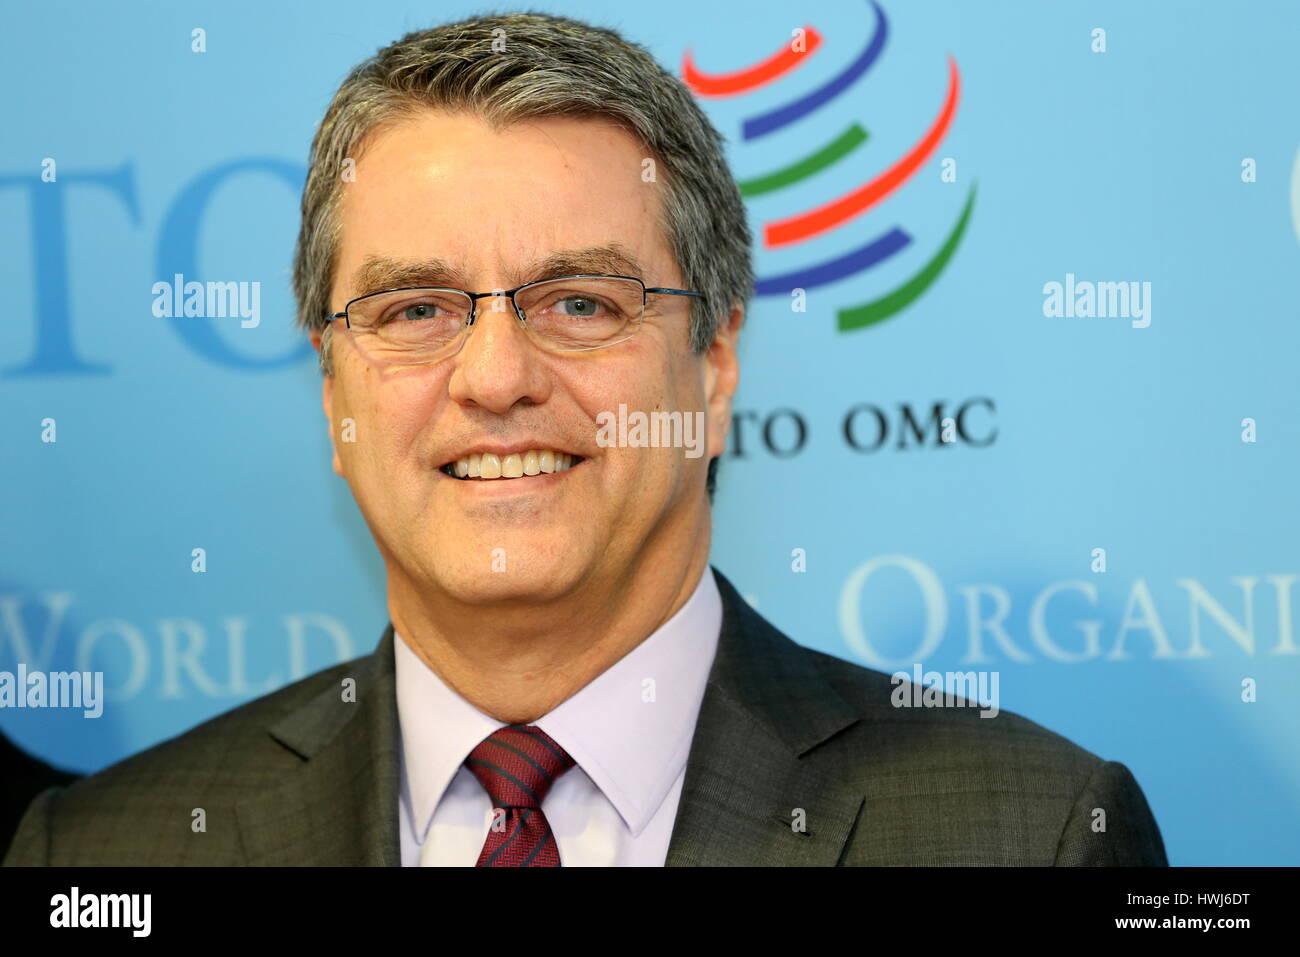 Brazilian Roberto Azevêdo on 22 Feb. 2017 when the World Trade Organization's Trade Facilitation Agreement (TFA) Stock Photo